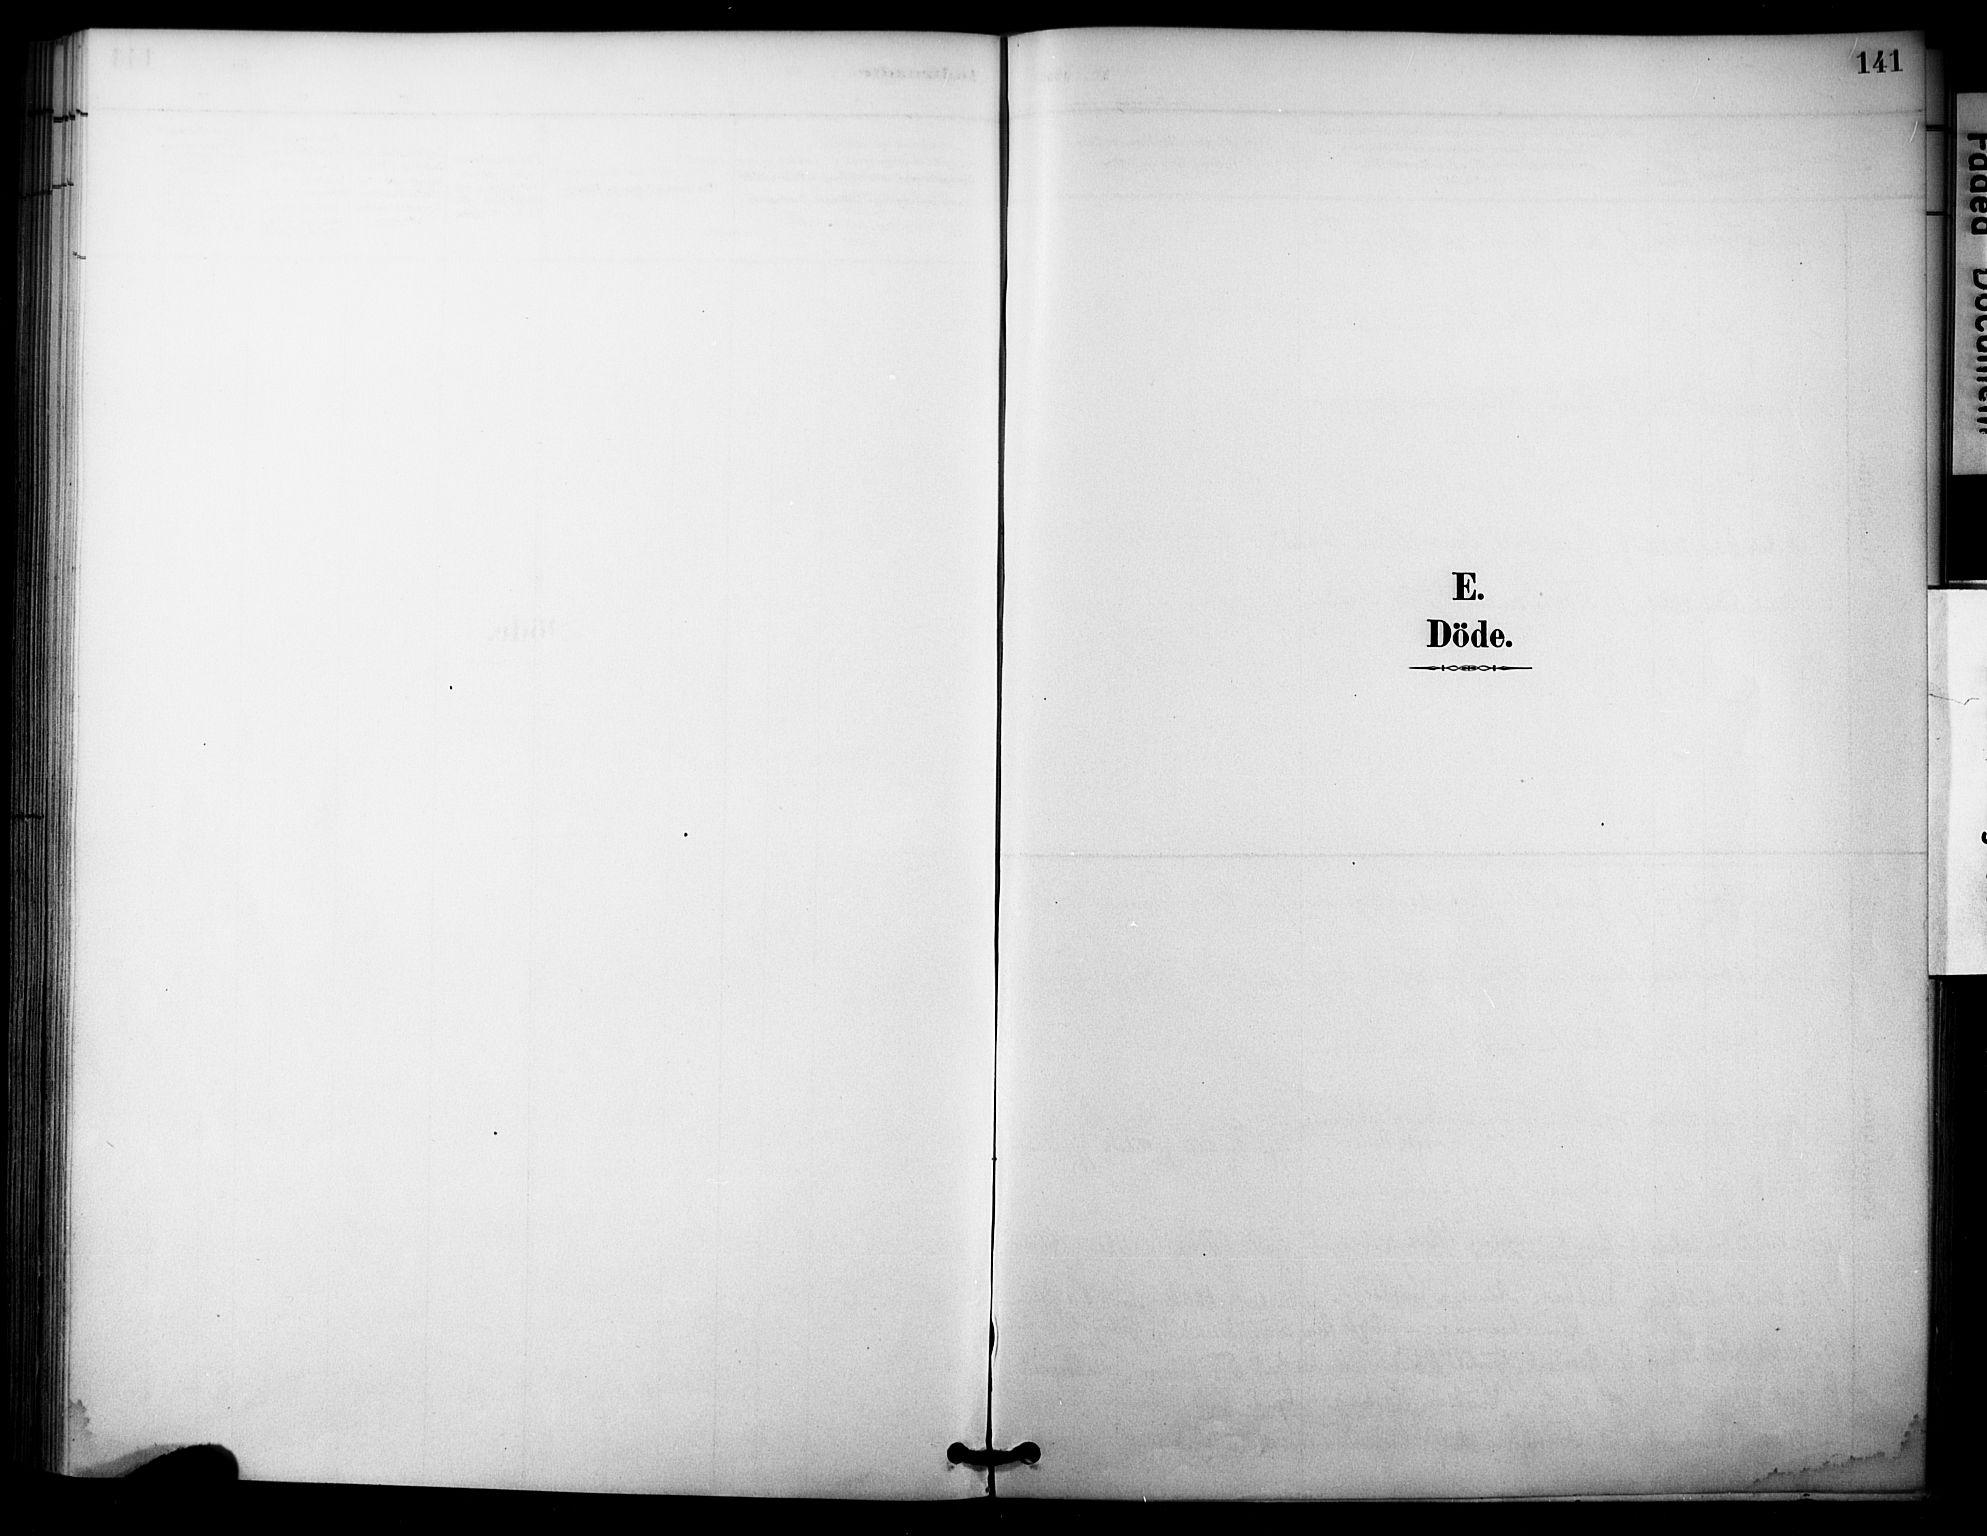 SAKO, Nore kirkebøker, F/Fc/L0004: Ministerialbok nr. III 4, 1885-1898, s. 141